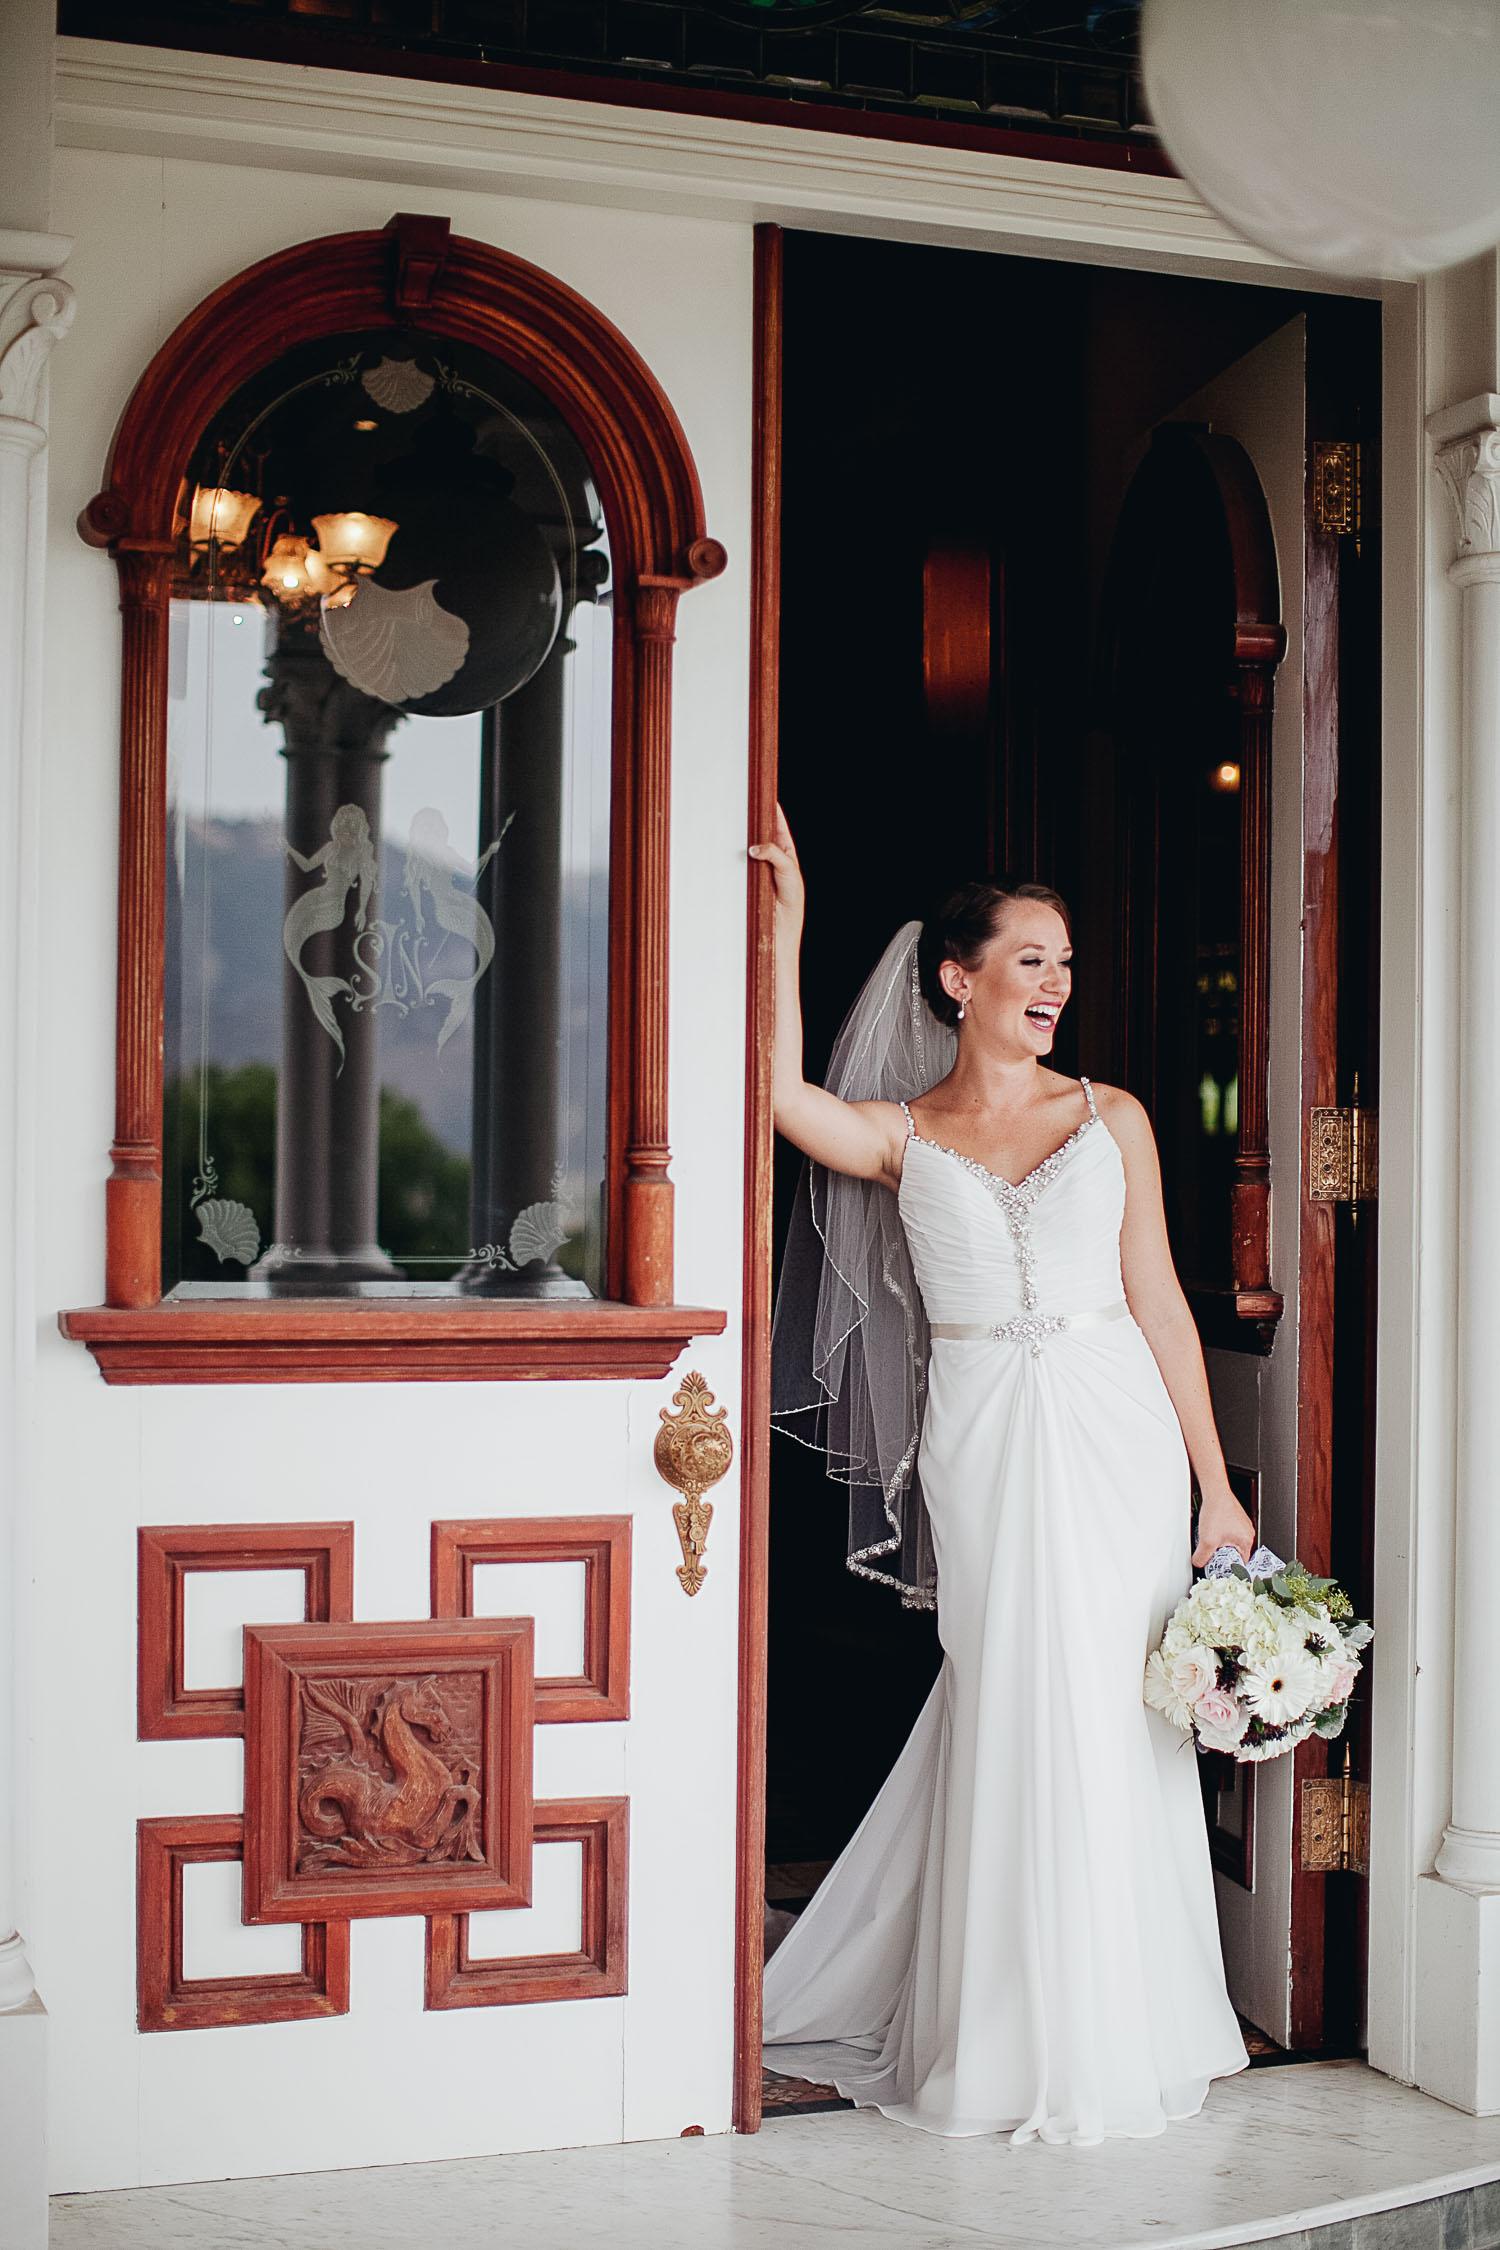 JMPHOTOART-Wedding-Photographer-10.jpg